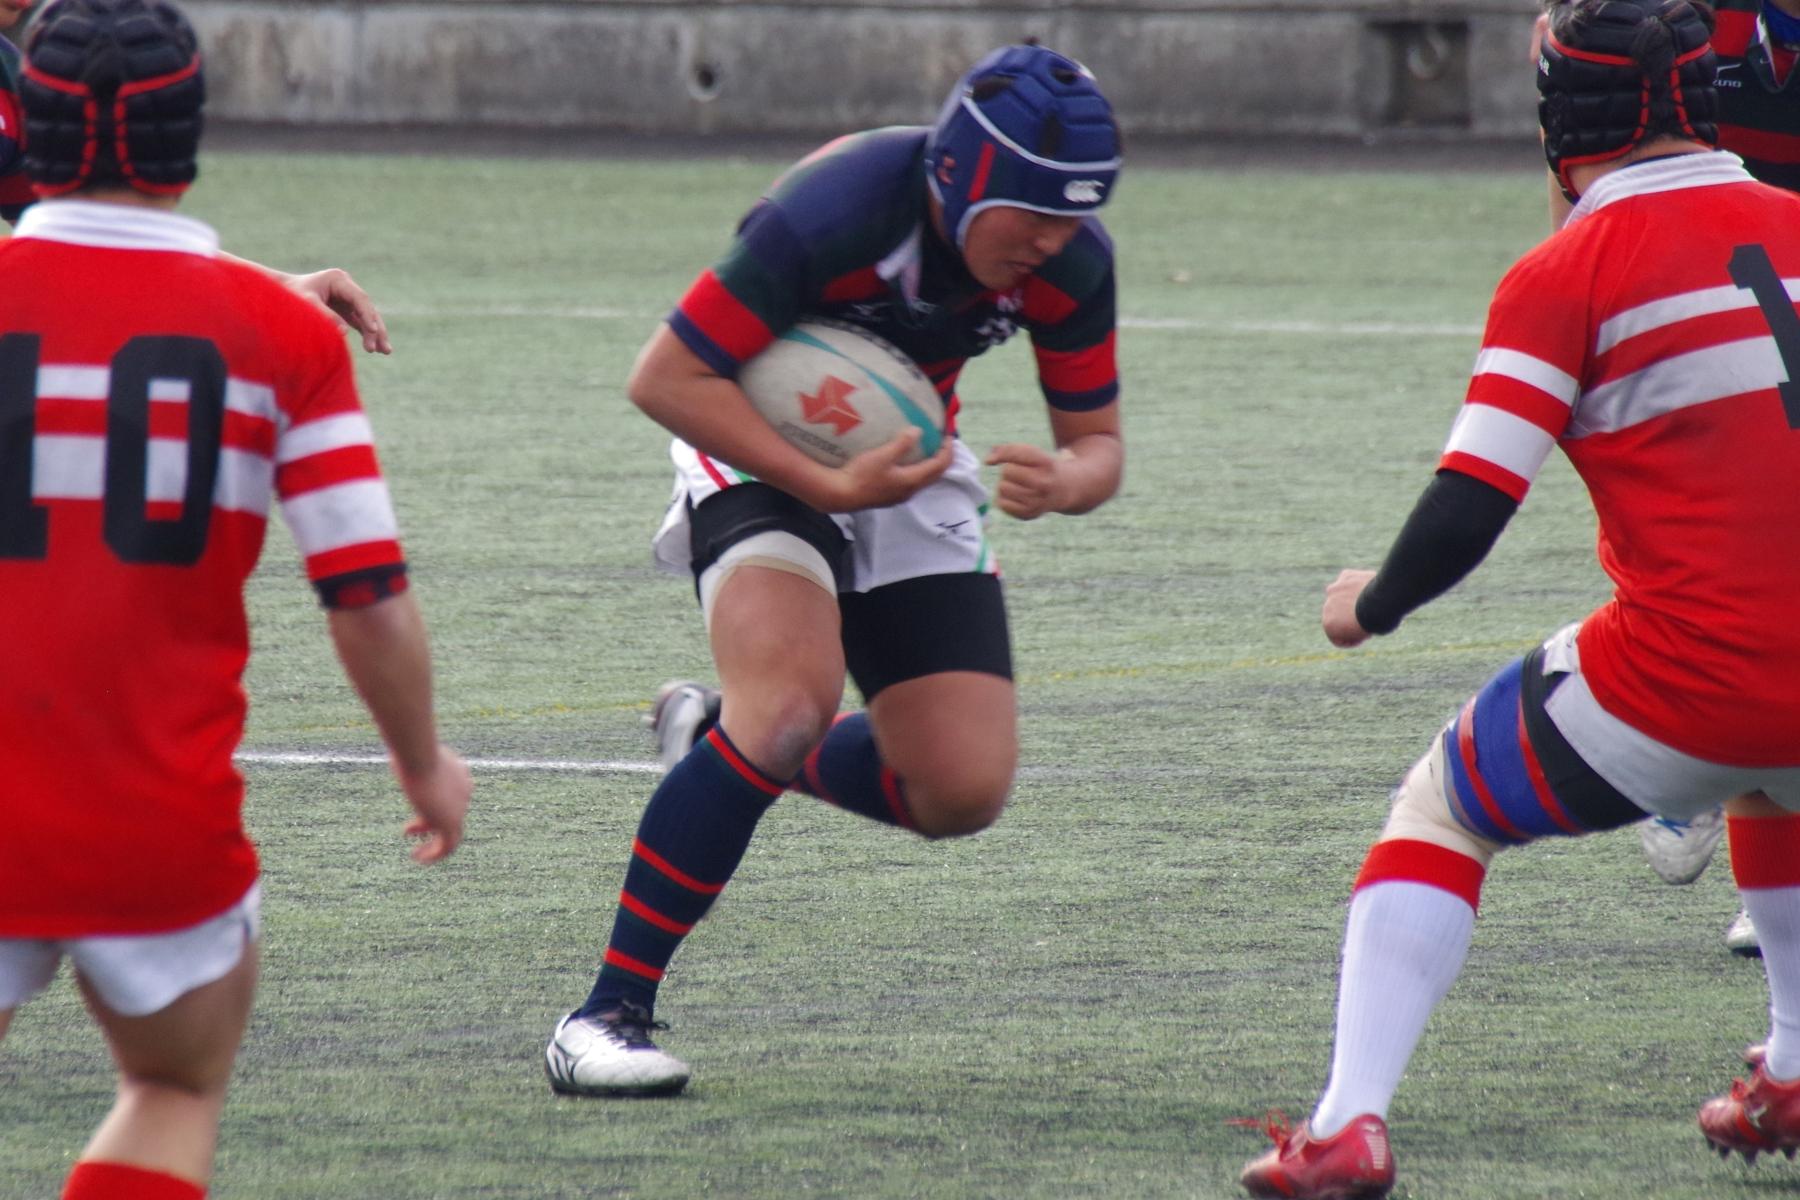 http://kokura-rugby.sakura.ne.jp/180114-5.jpg